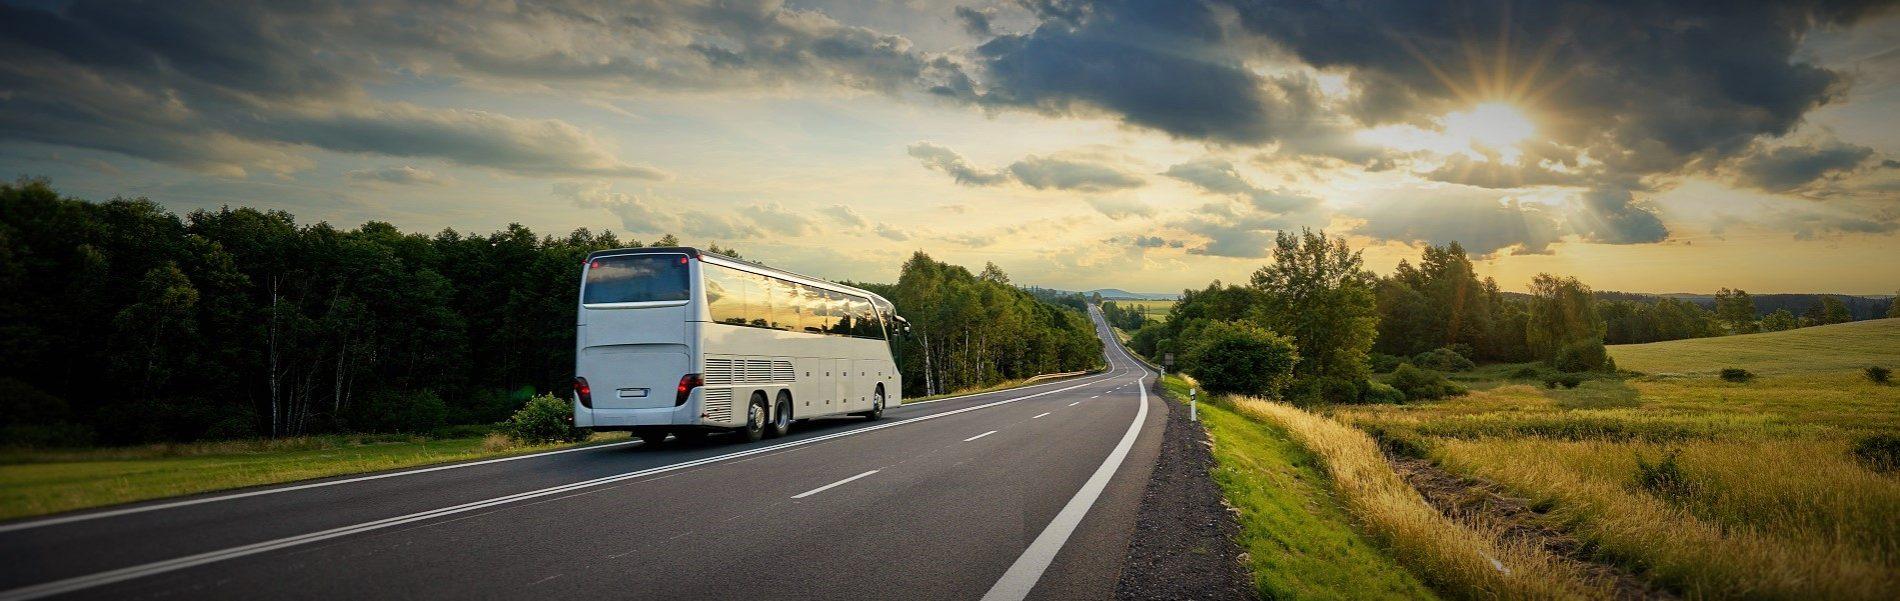 Coach Tours of Britain